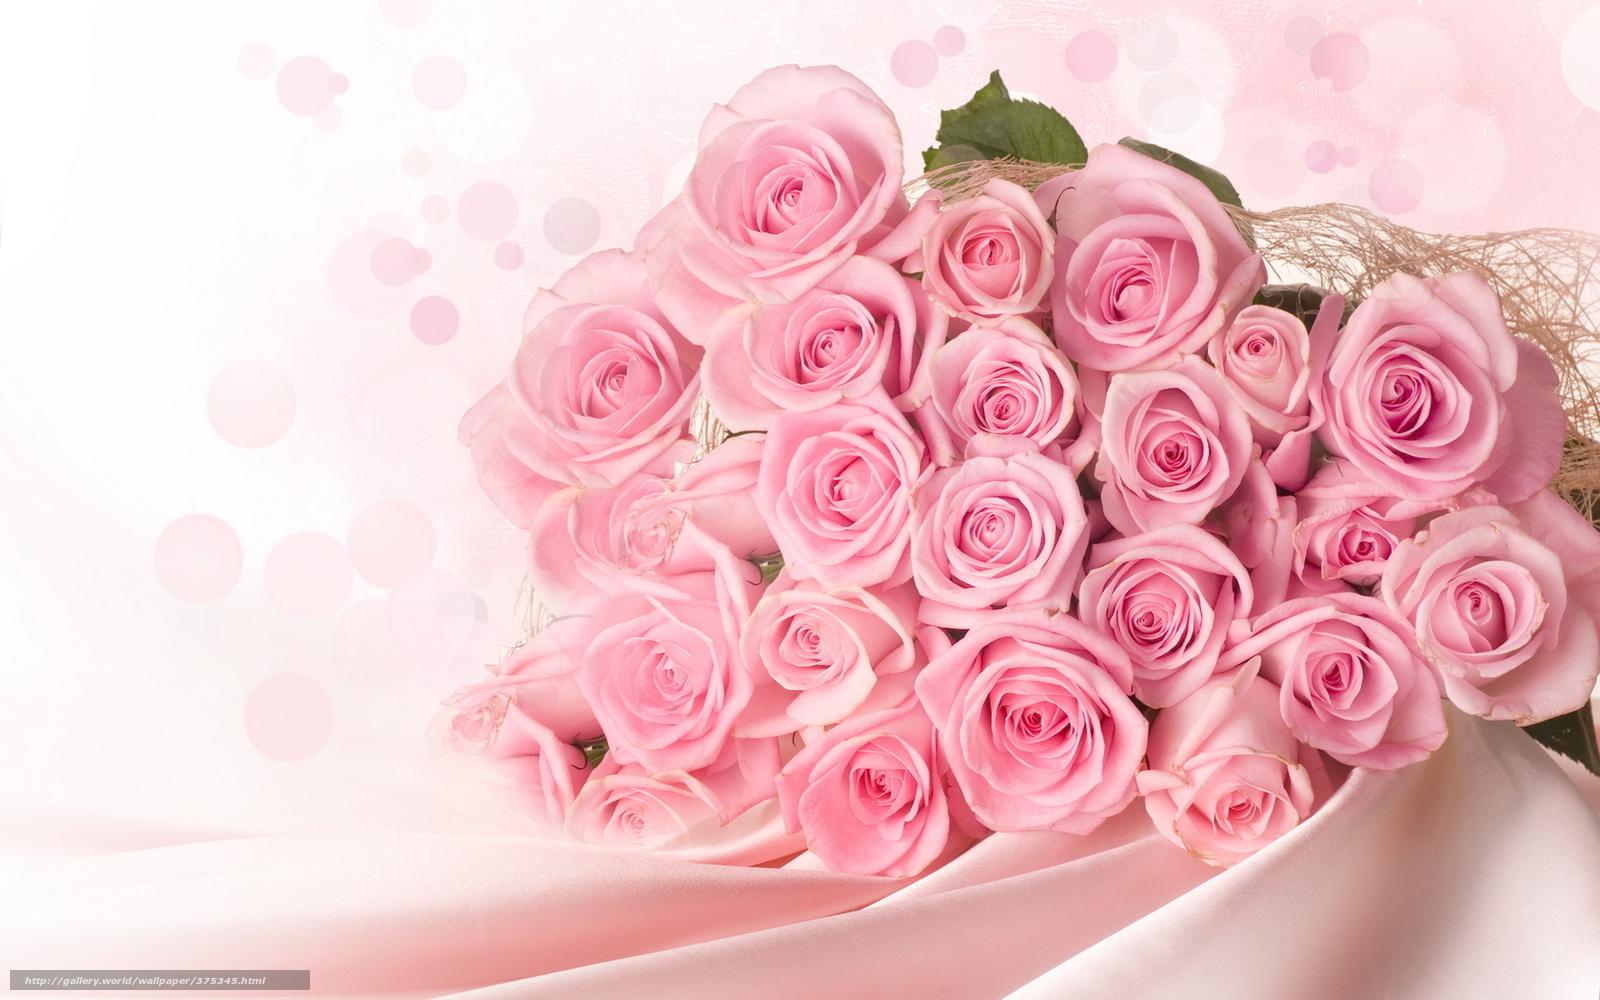 Fond D Ecran Bouquet De Rose Gite Pompadour Lubersac